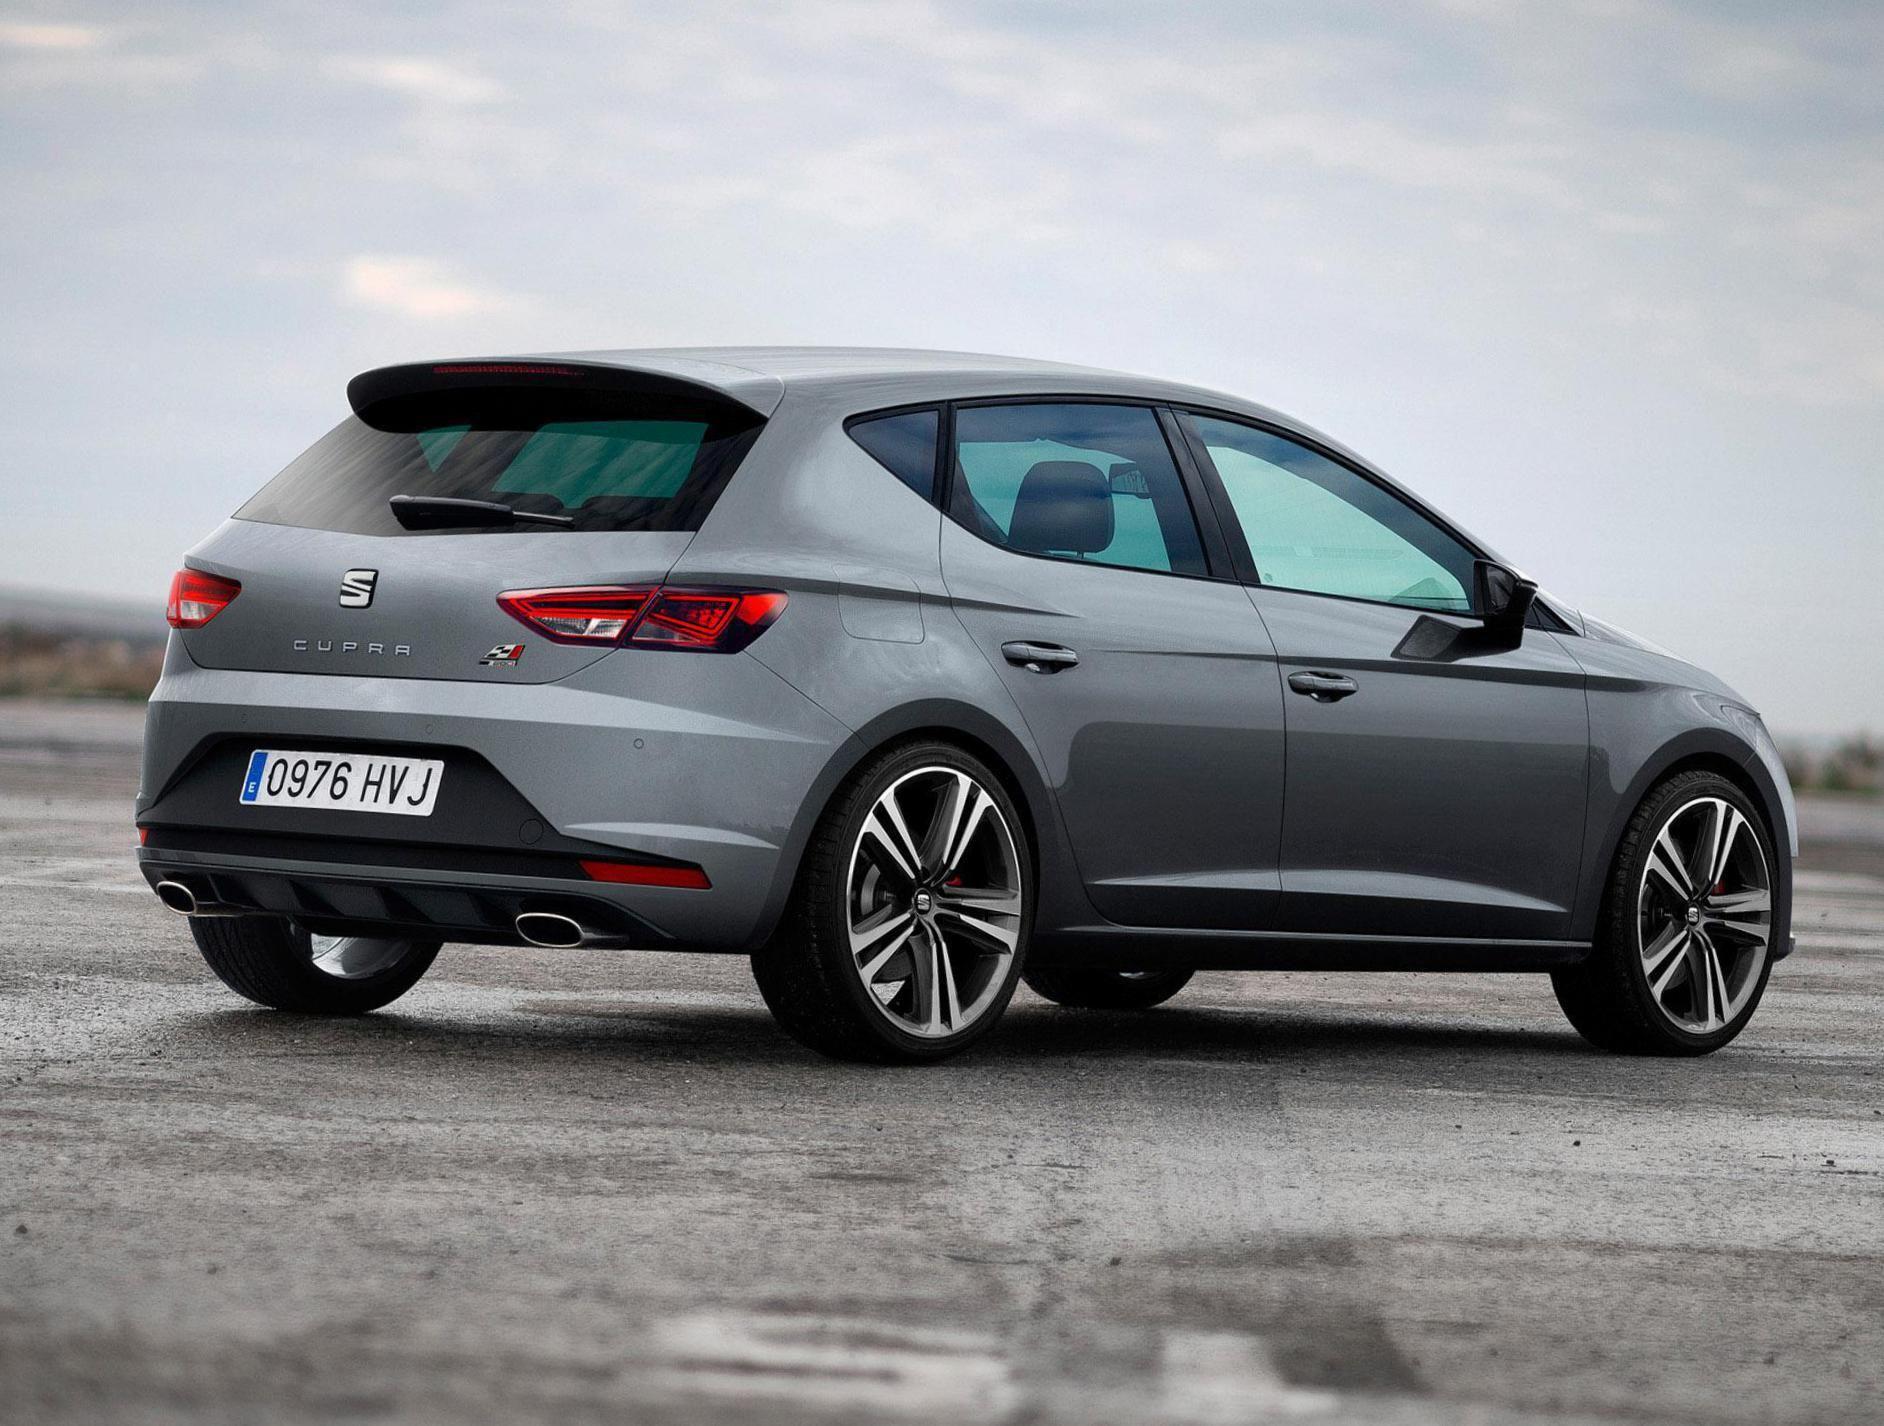 Leon Cupra Seat lease - http://autotras.com | GTI, VW, and ...